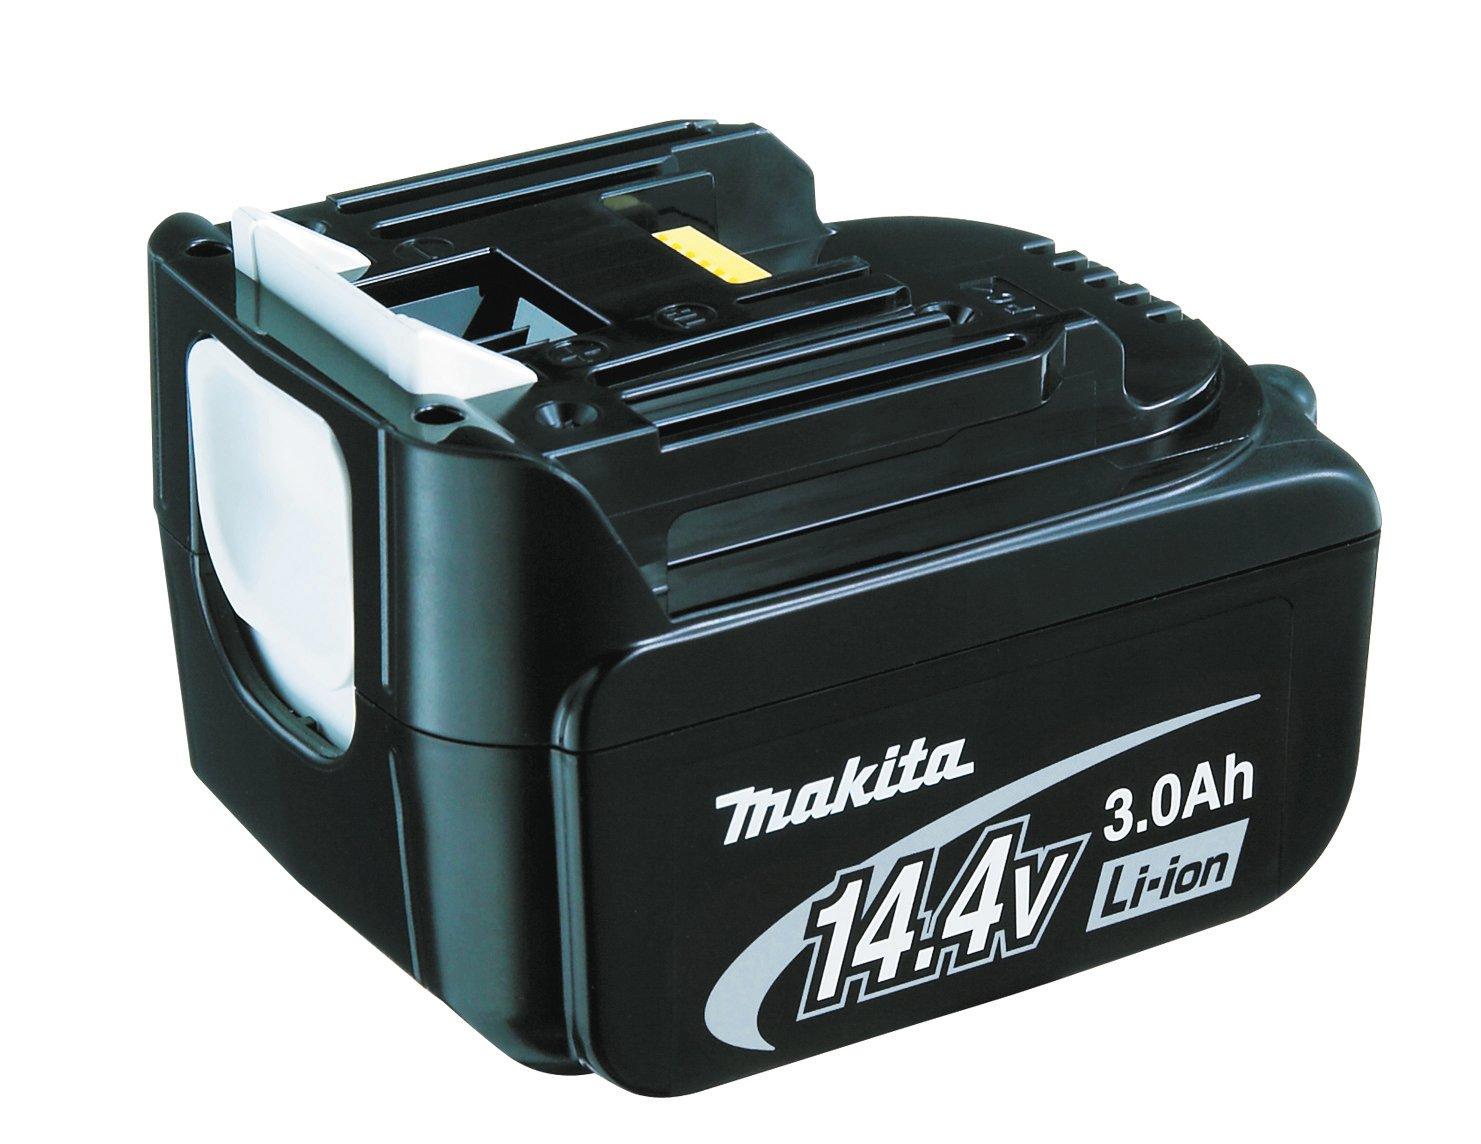 Makita-BDA341RFE-Akku-Winkelbohrmaschine-144-V-2-Akkus-und-Ladegert